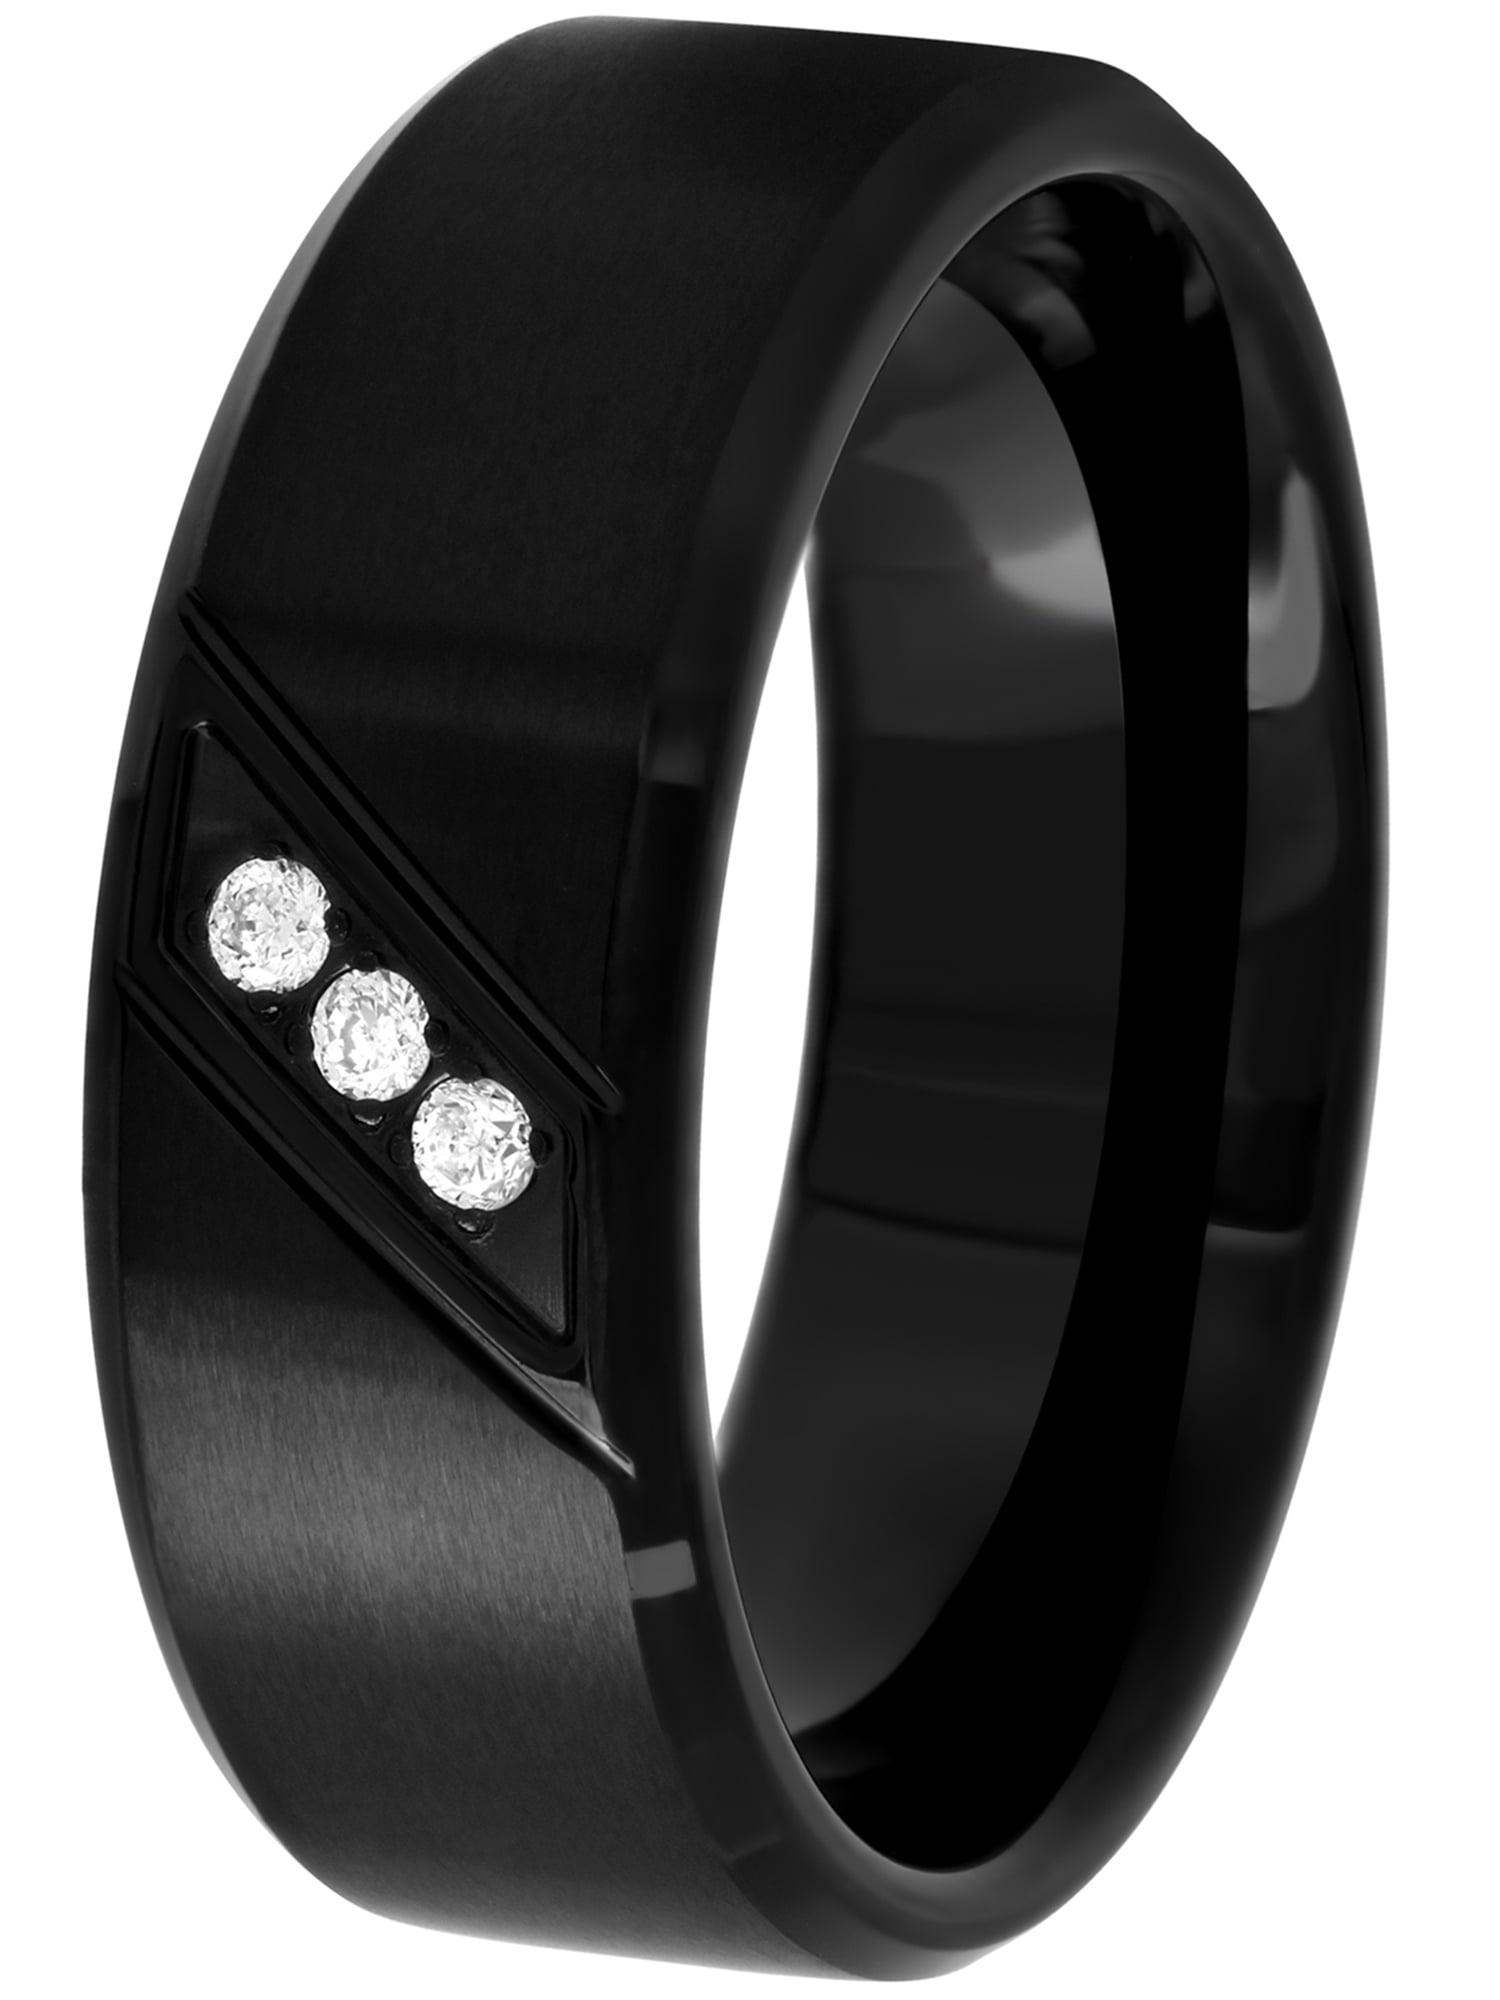 Brilliance Fine Jewelry Men S Black Stainless Steel Diamond Accent Wedding Band Mens Ring Walmart Com Walmart Com